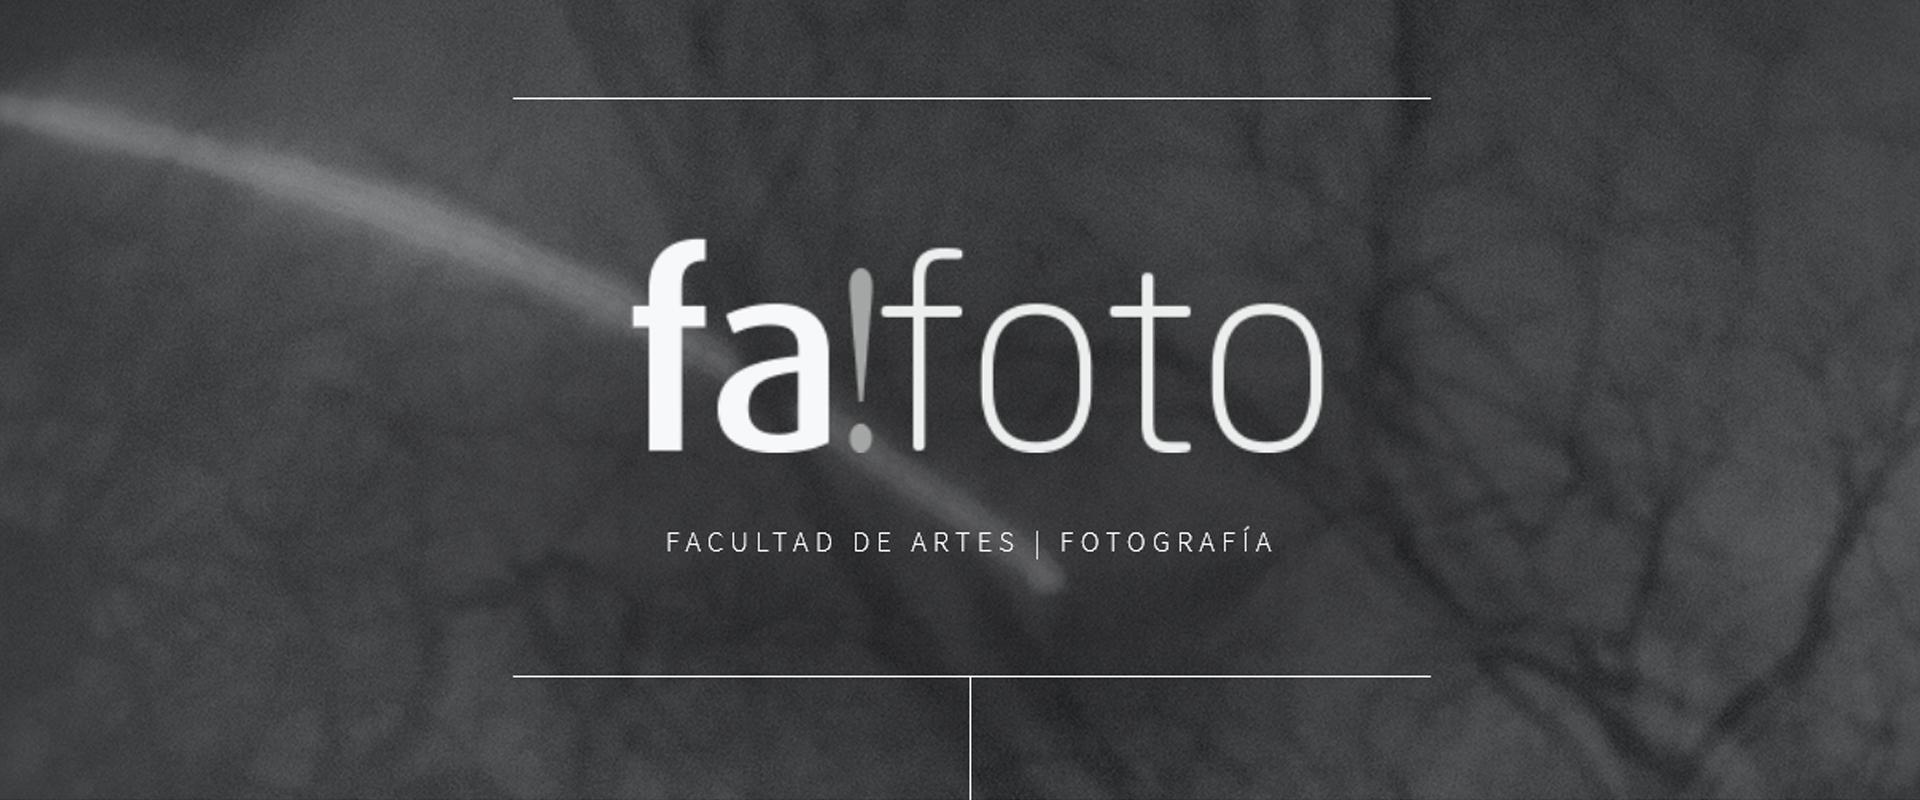 Concursos FA! Foto